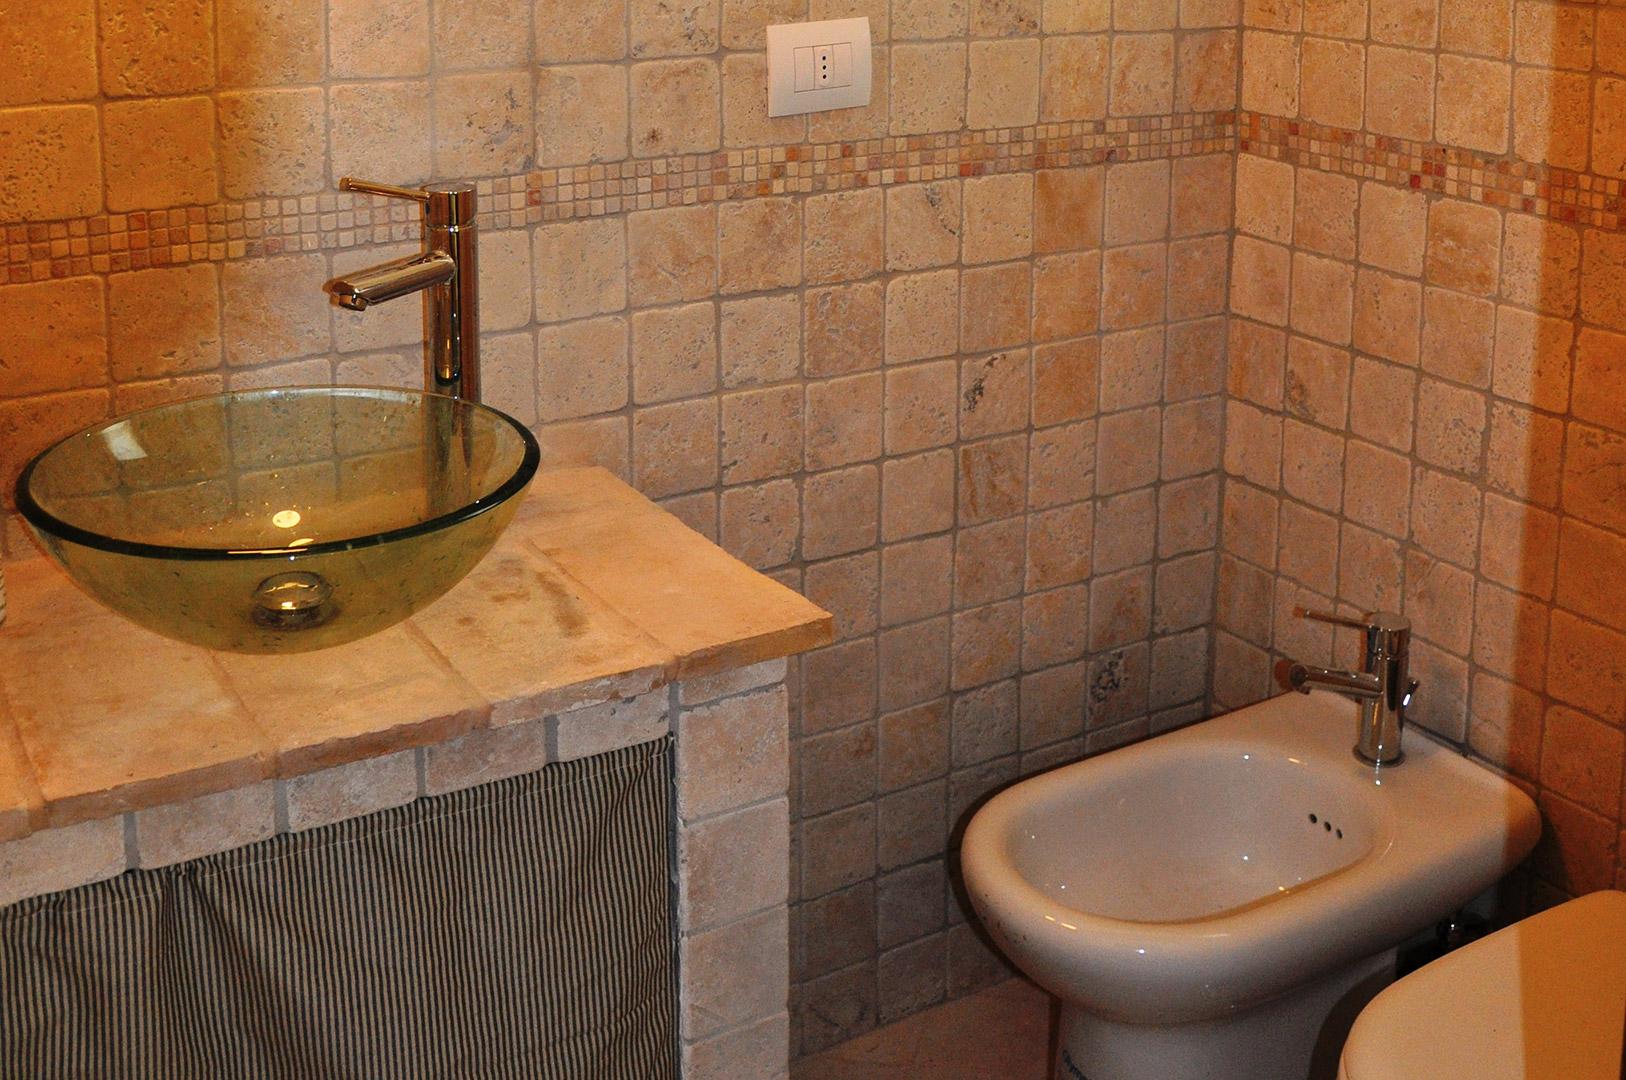 Argentario montecristo country house - Tisane per andare in bagno ...